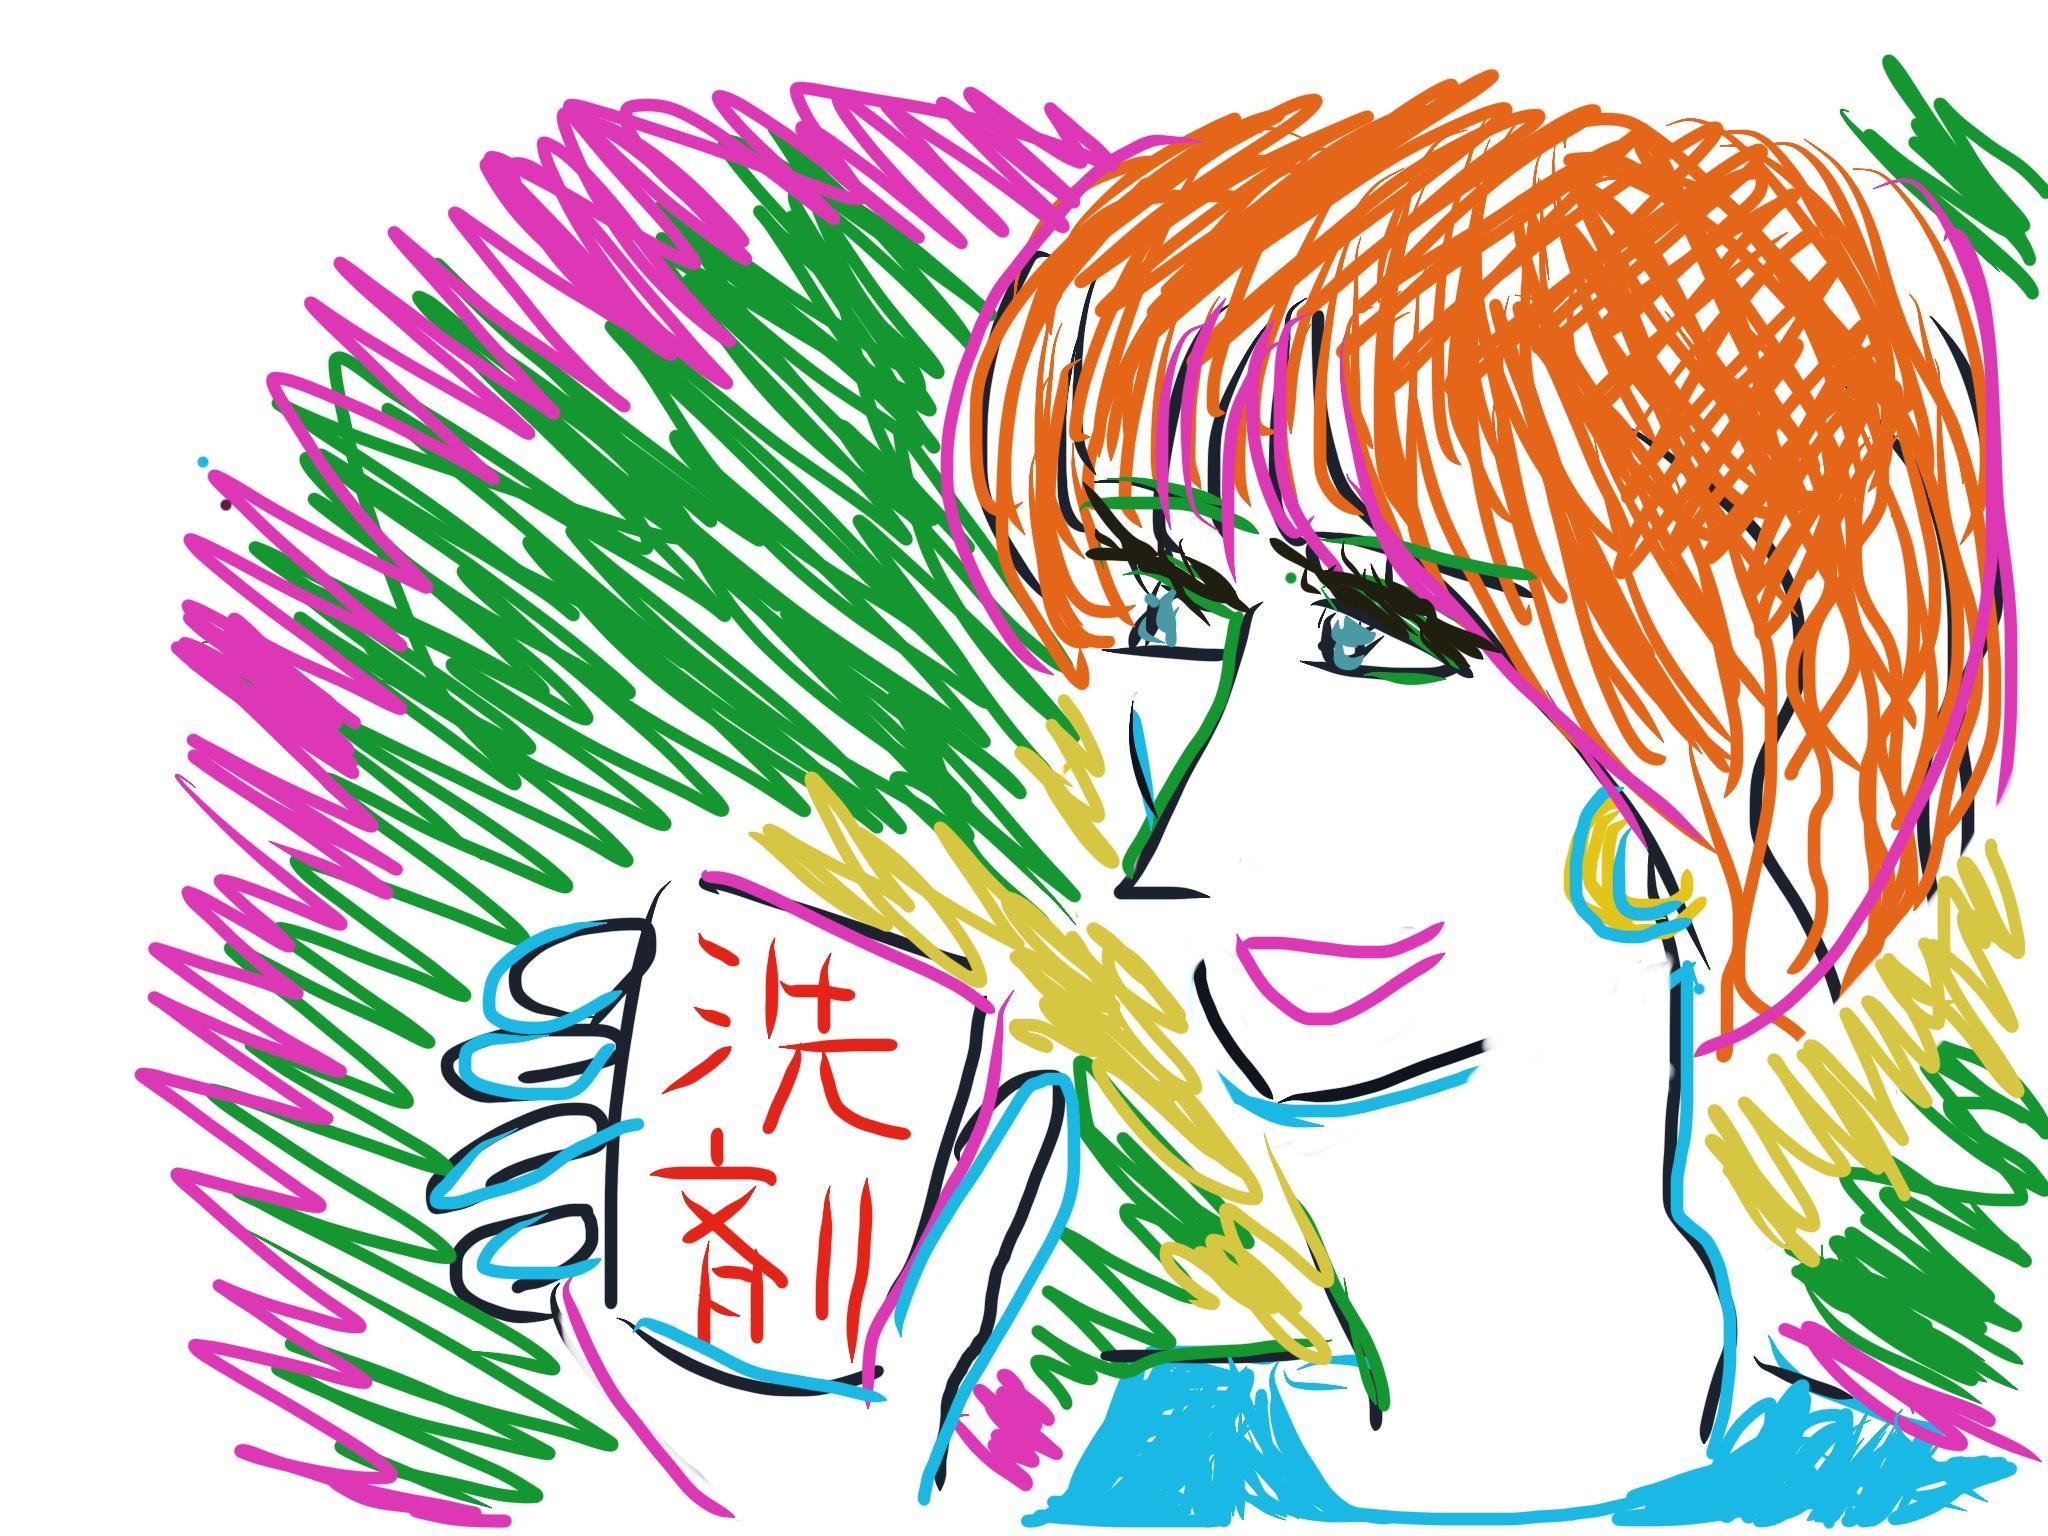 http://igs-kankan.com/article/f161e9d41df37e662414c1fc64fb76ef9d130ce2.jpg